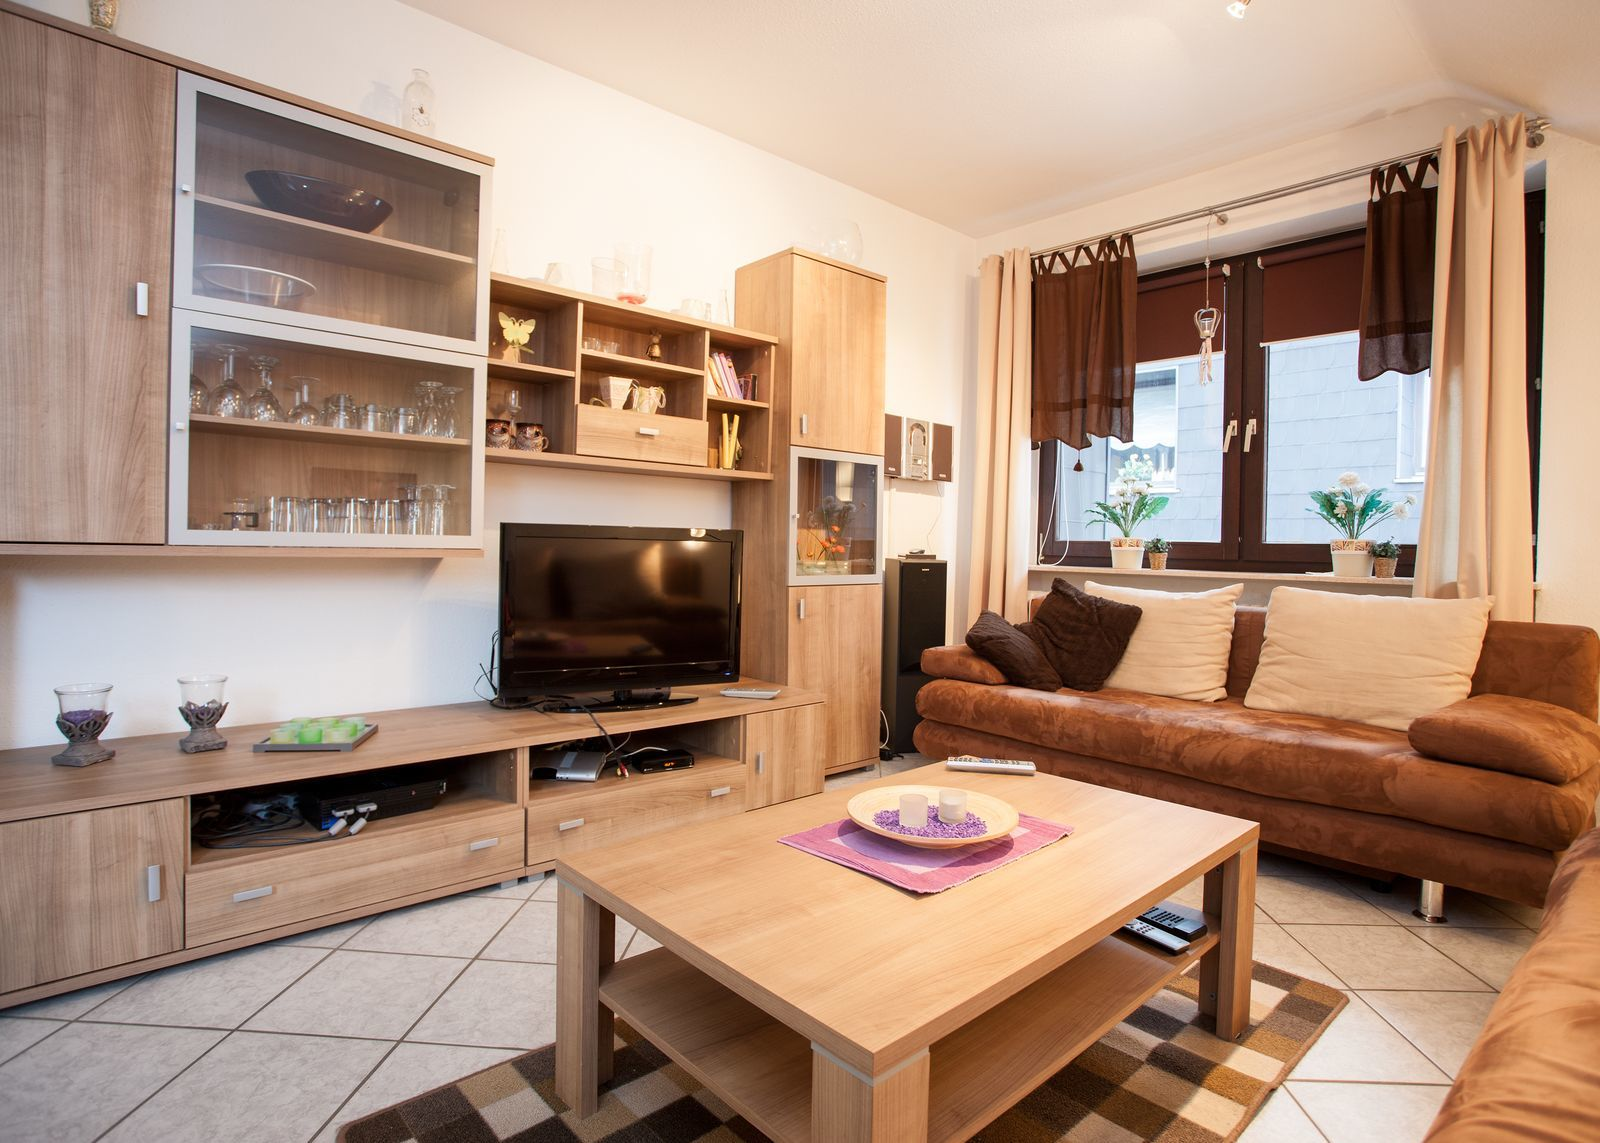 Apartment - Am Waltenberg 57-R